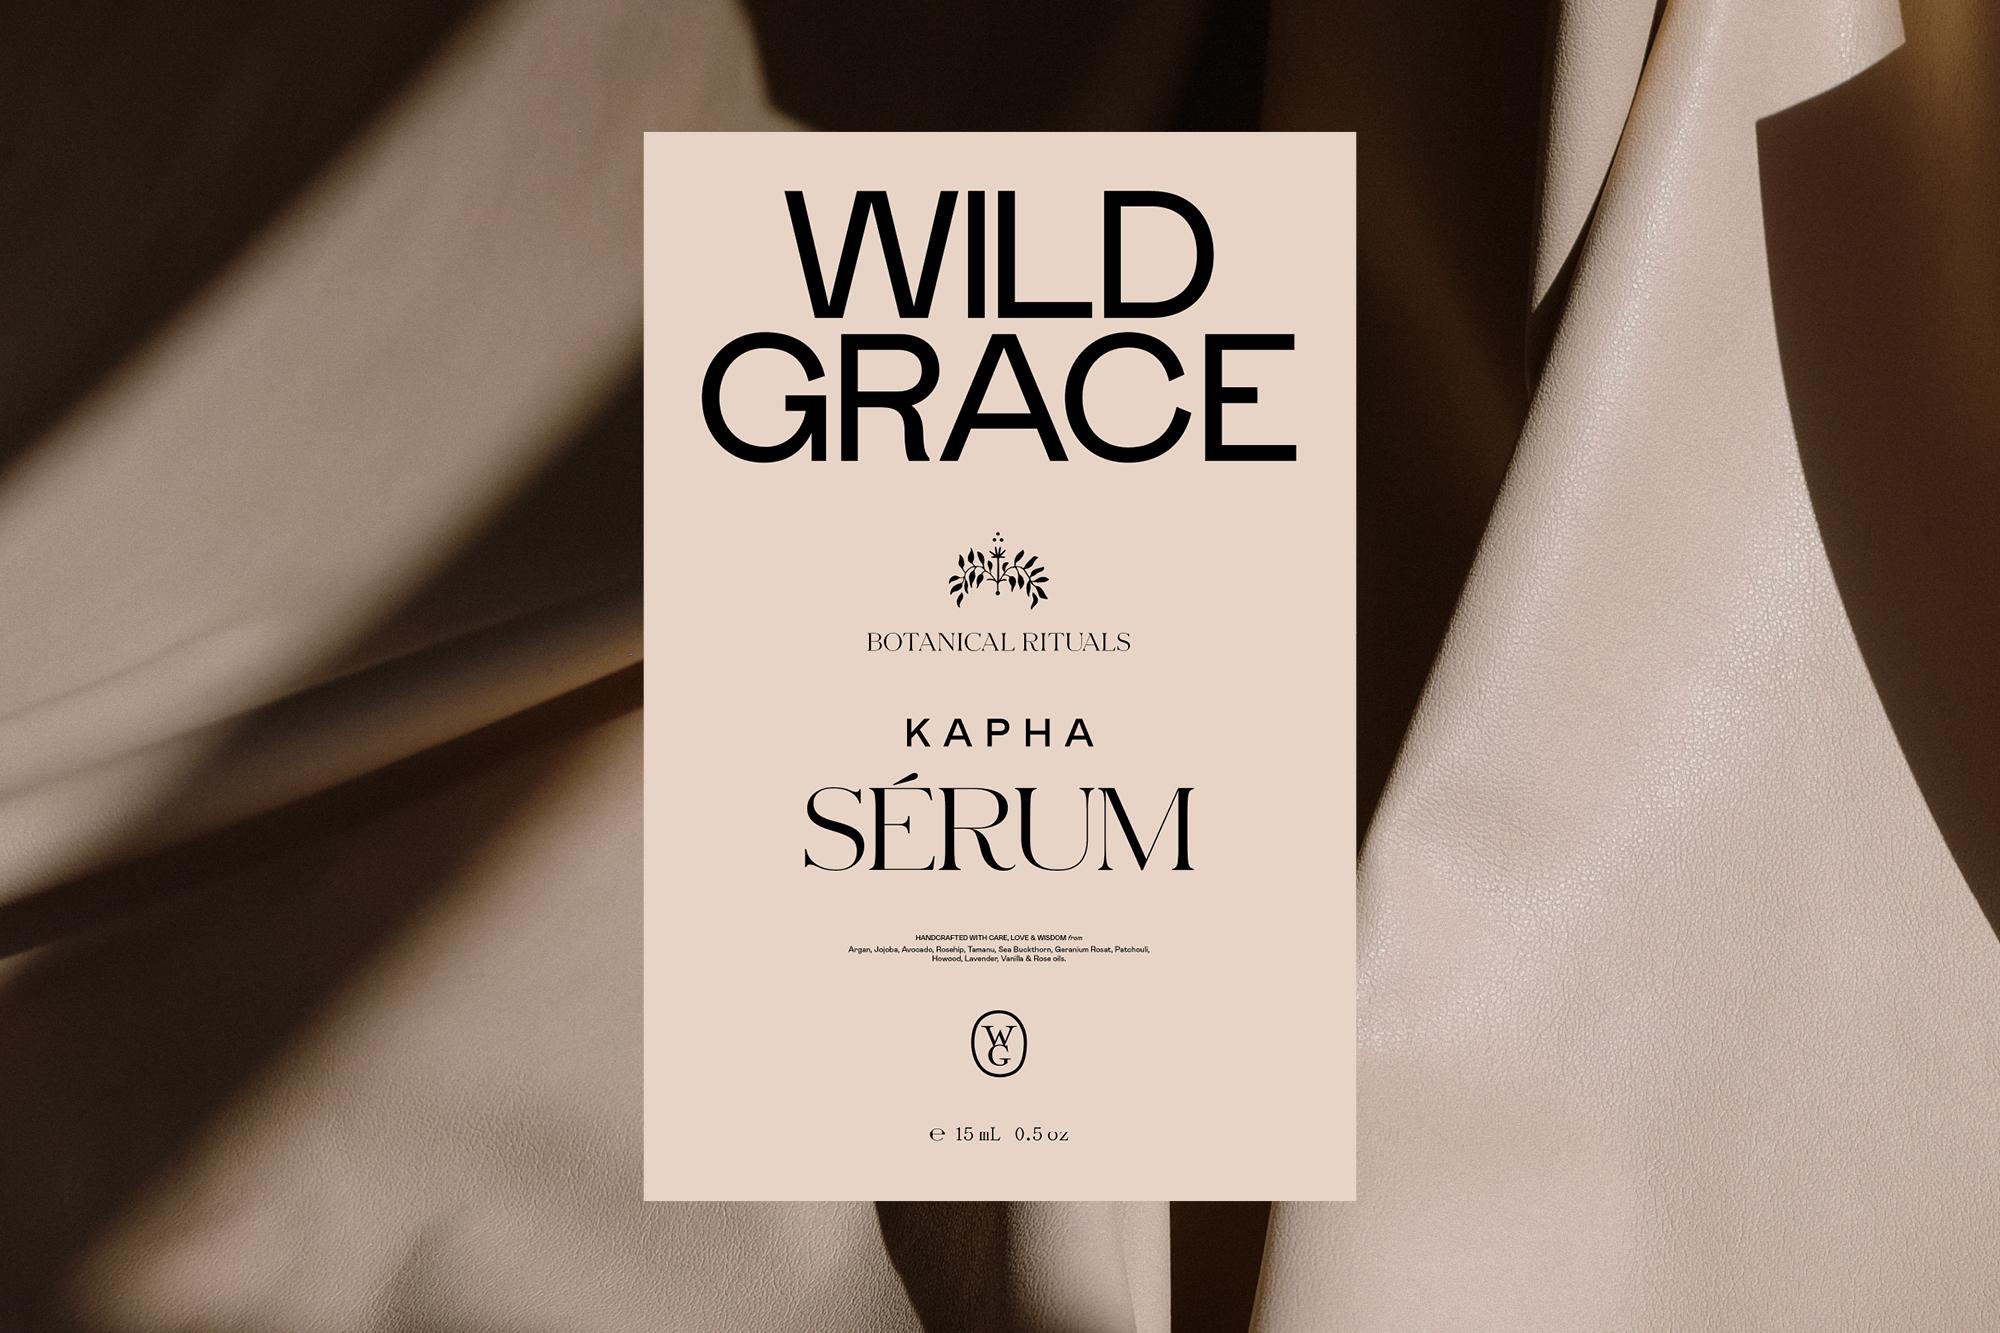 Wild Grace